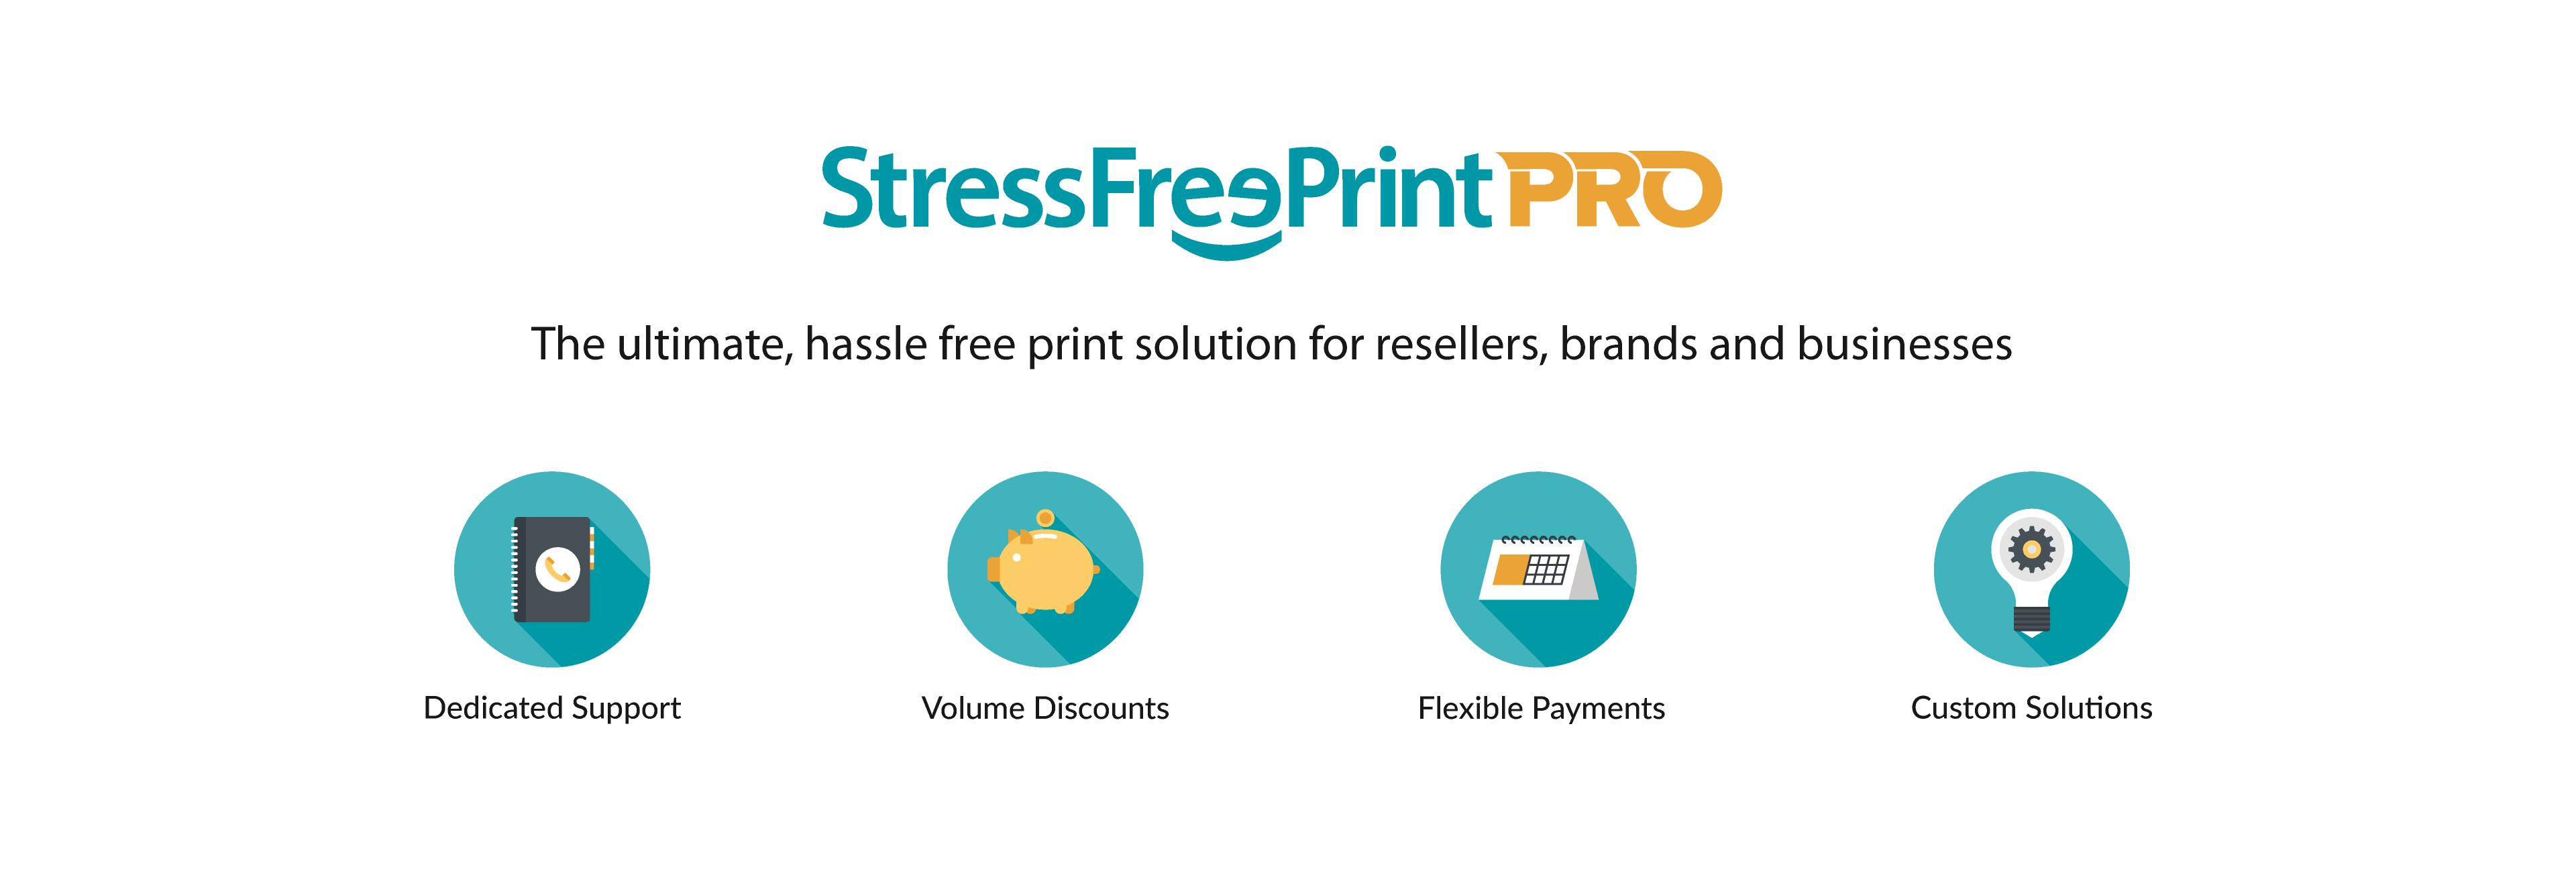 Pro from StressFreePrint